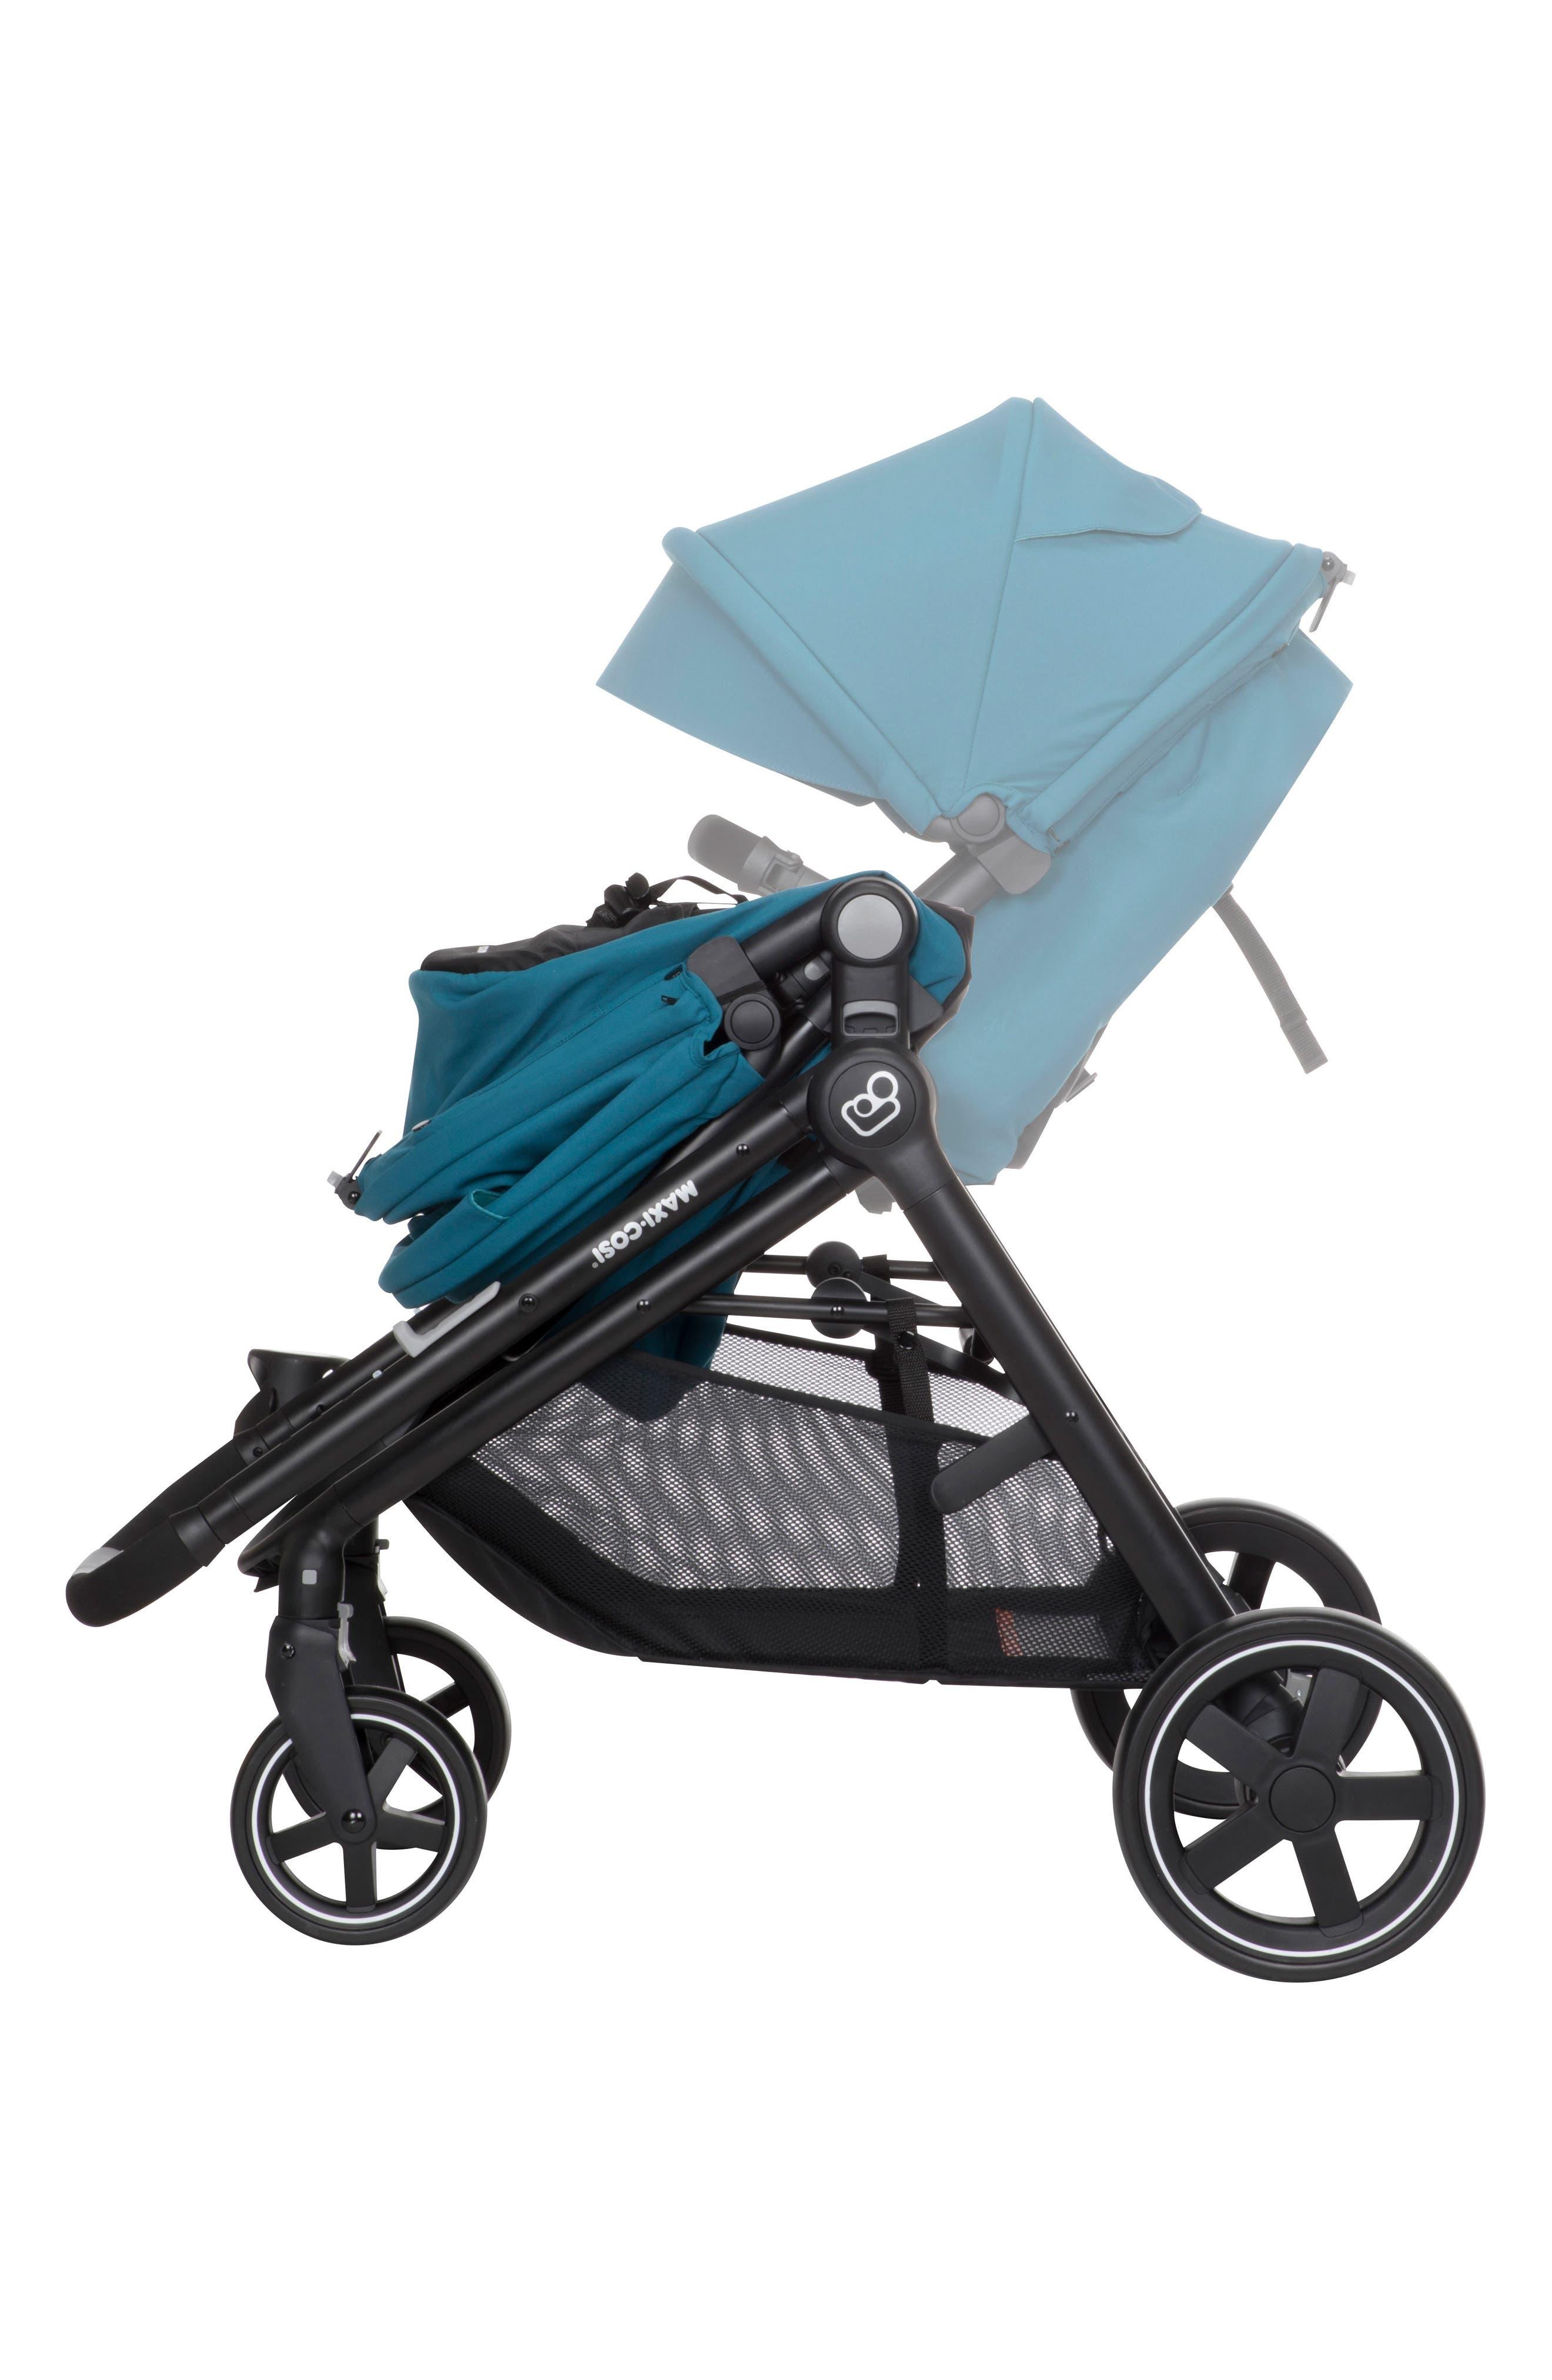 5-1 Mico 30 Infant Car Seat & Zelia Stroller Modular Travel System,                             Alternate thumbnail 2, color,                             EMERALD TIDE